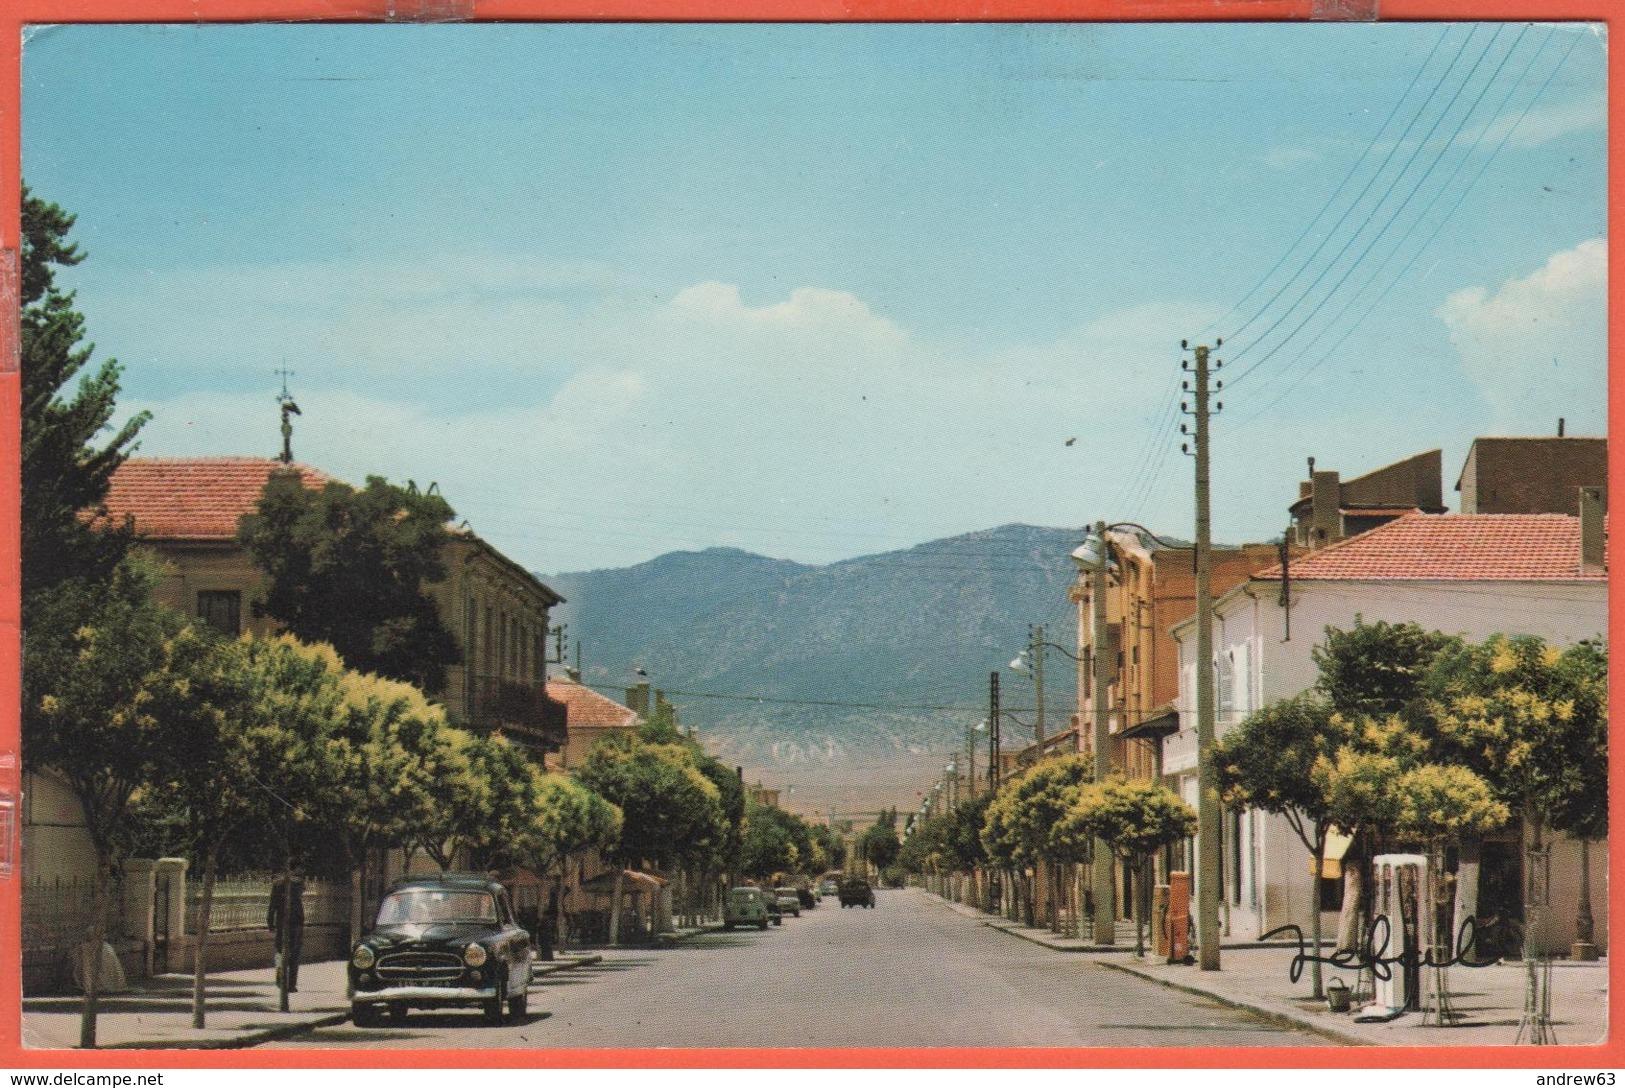 ALGERIA - ALGERIE - 19?? - Missed Stamp - Batna - Viaggiata Da ???? Per Tourcoing, France - Batna